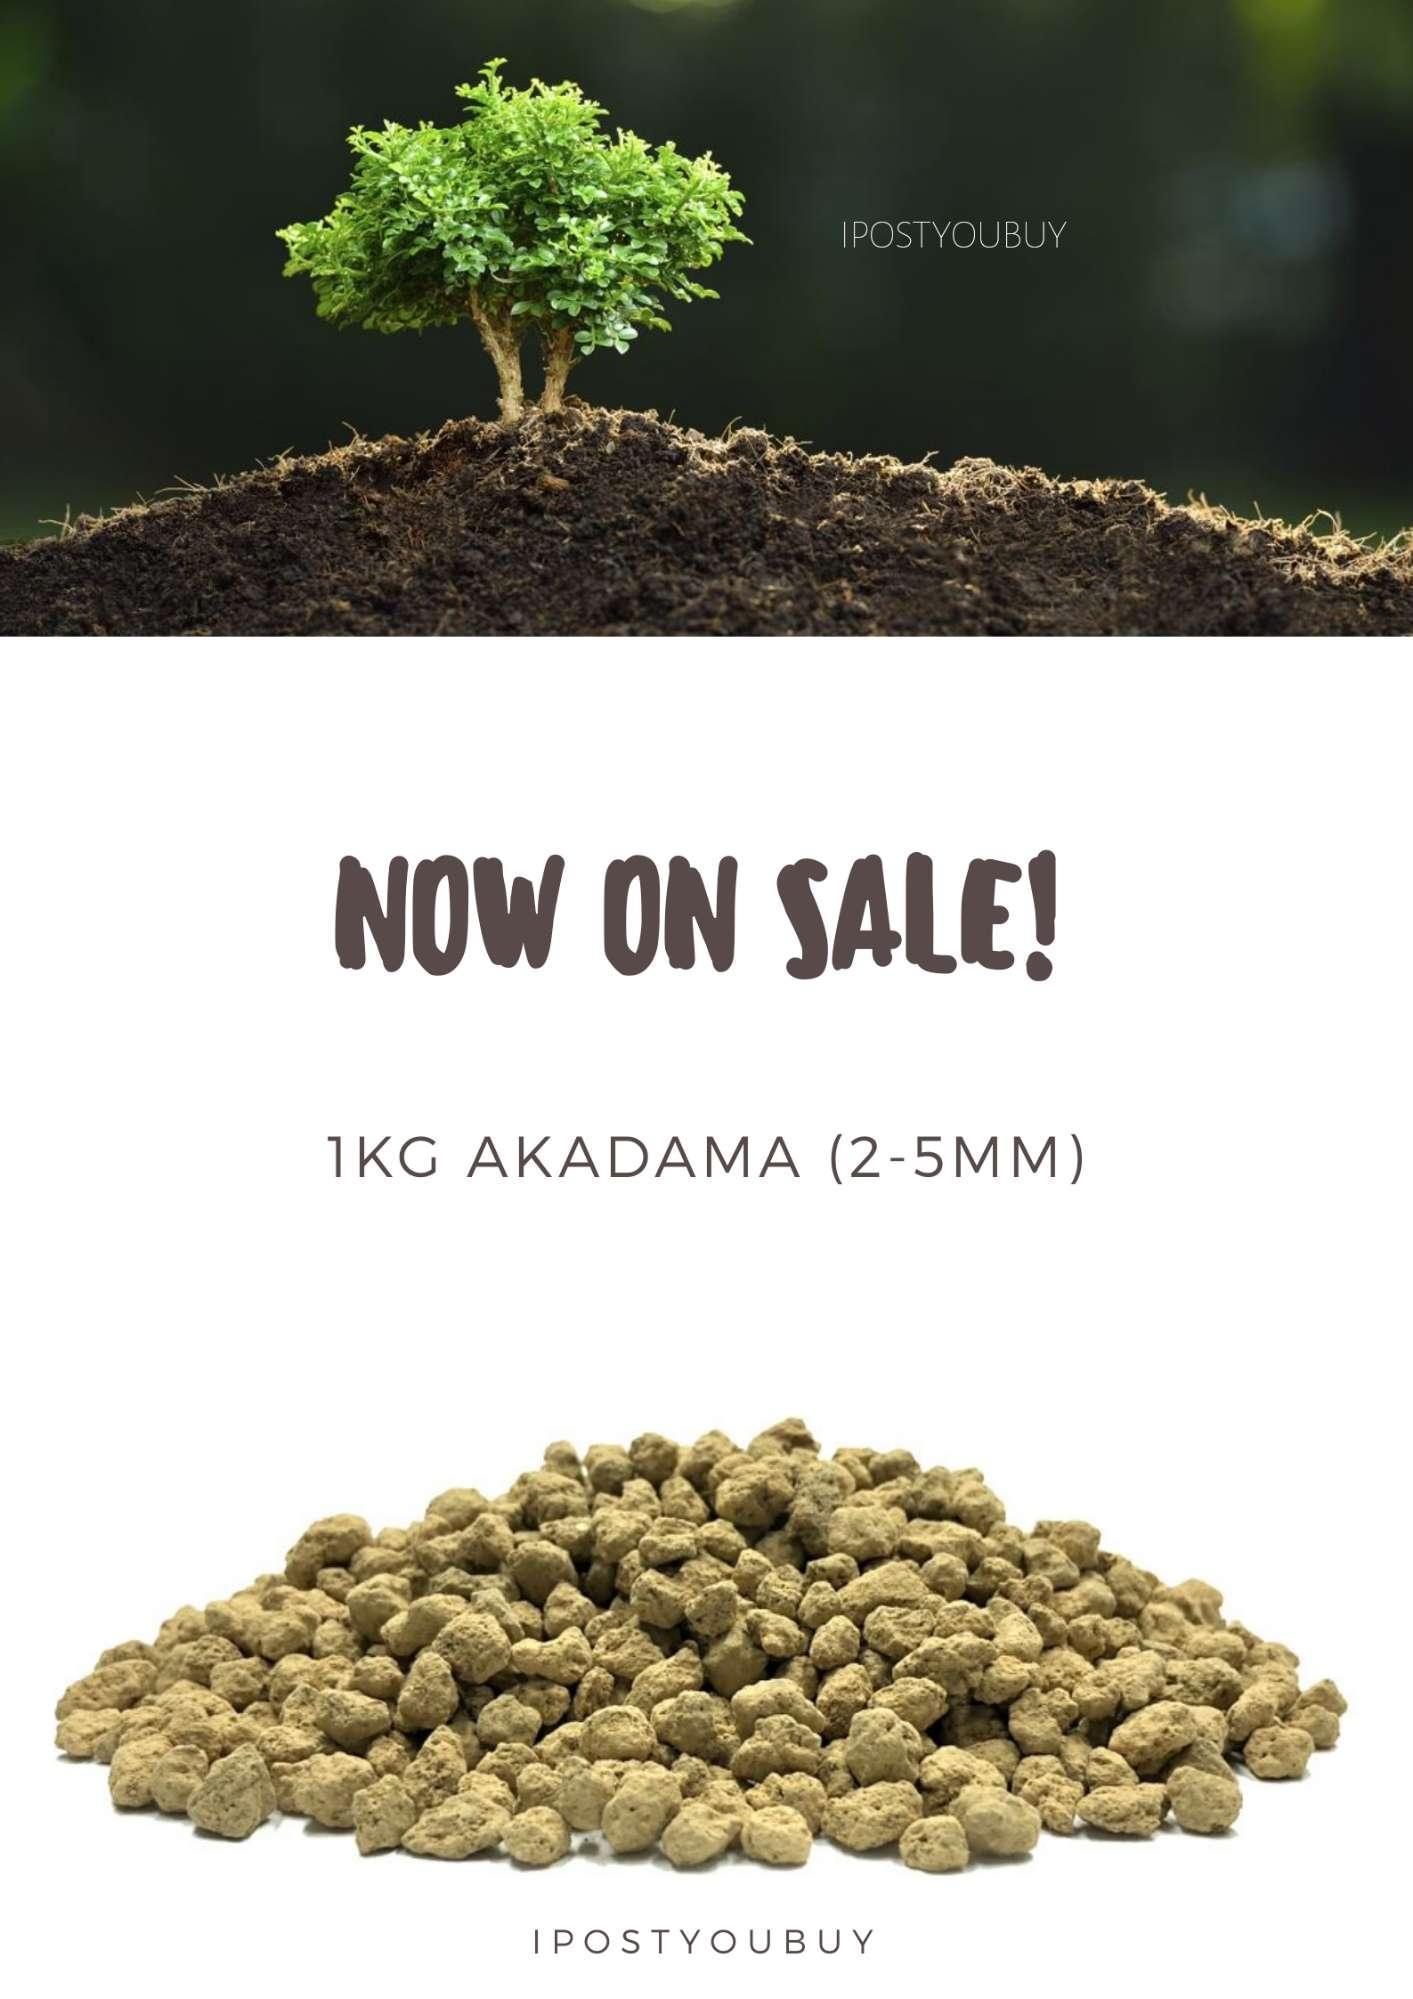 1KG Akadama Soil 2-5mm